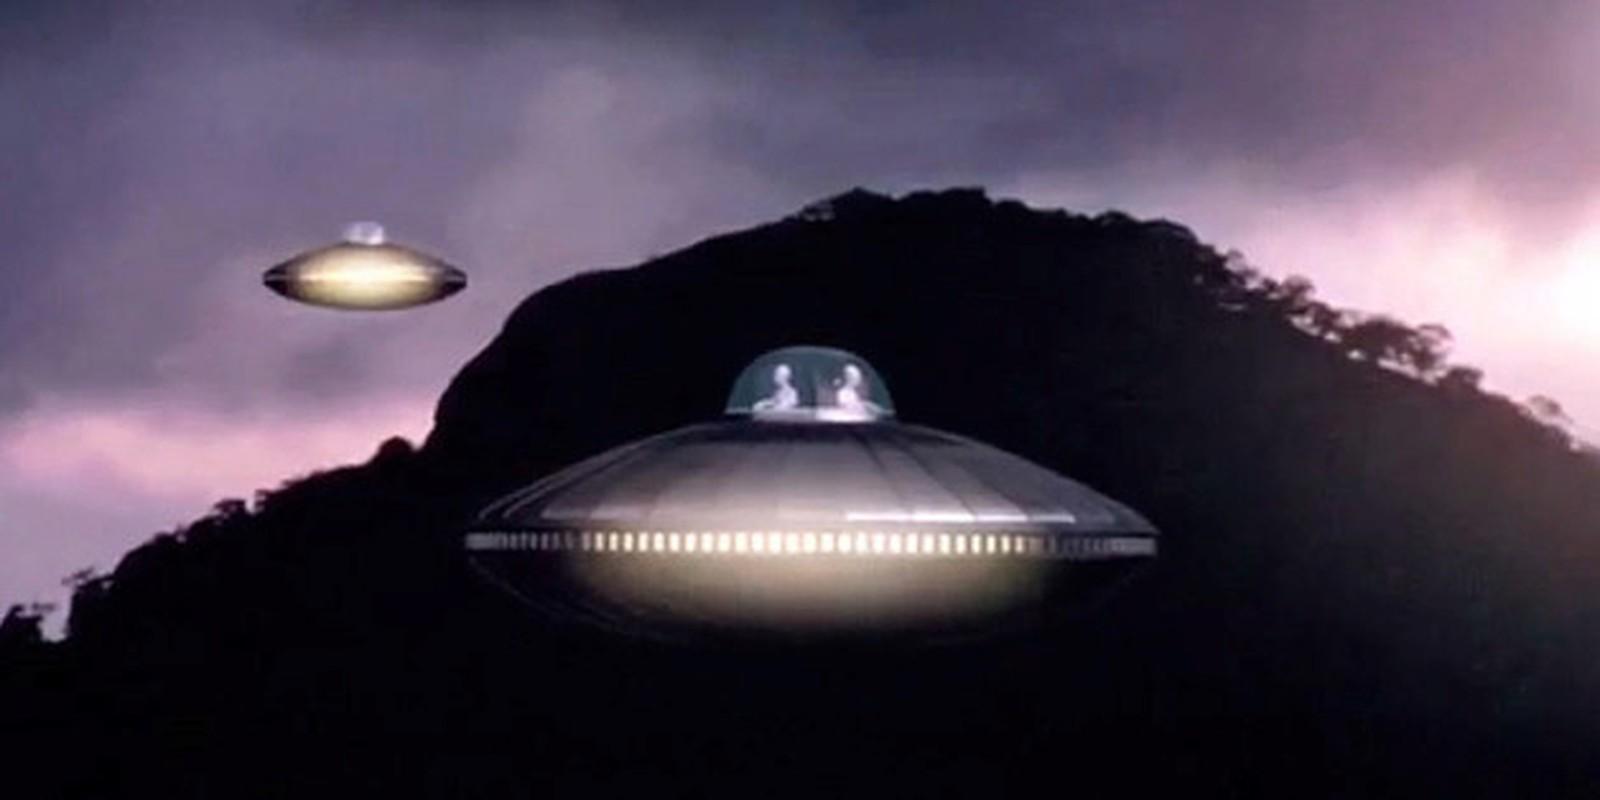 Kho giai nhung vu tai nan UFO bi an nhat the gioi-Hinh-6